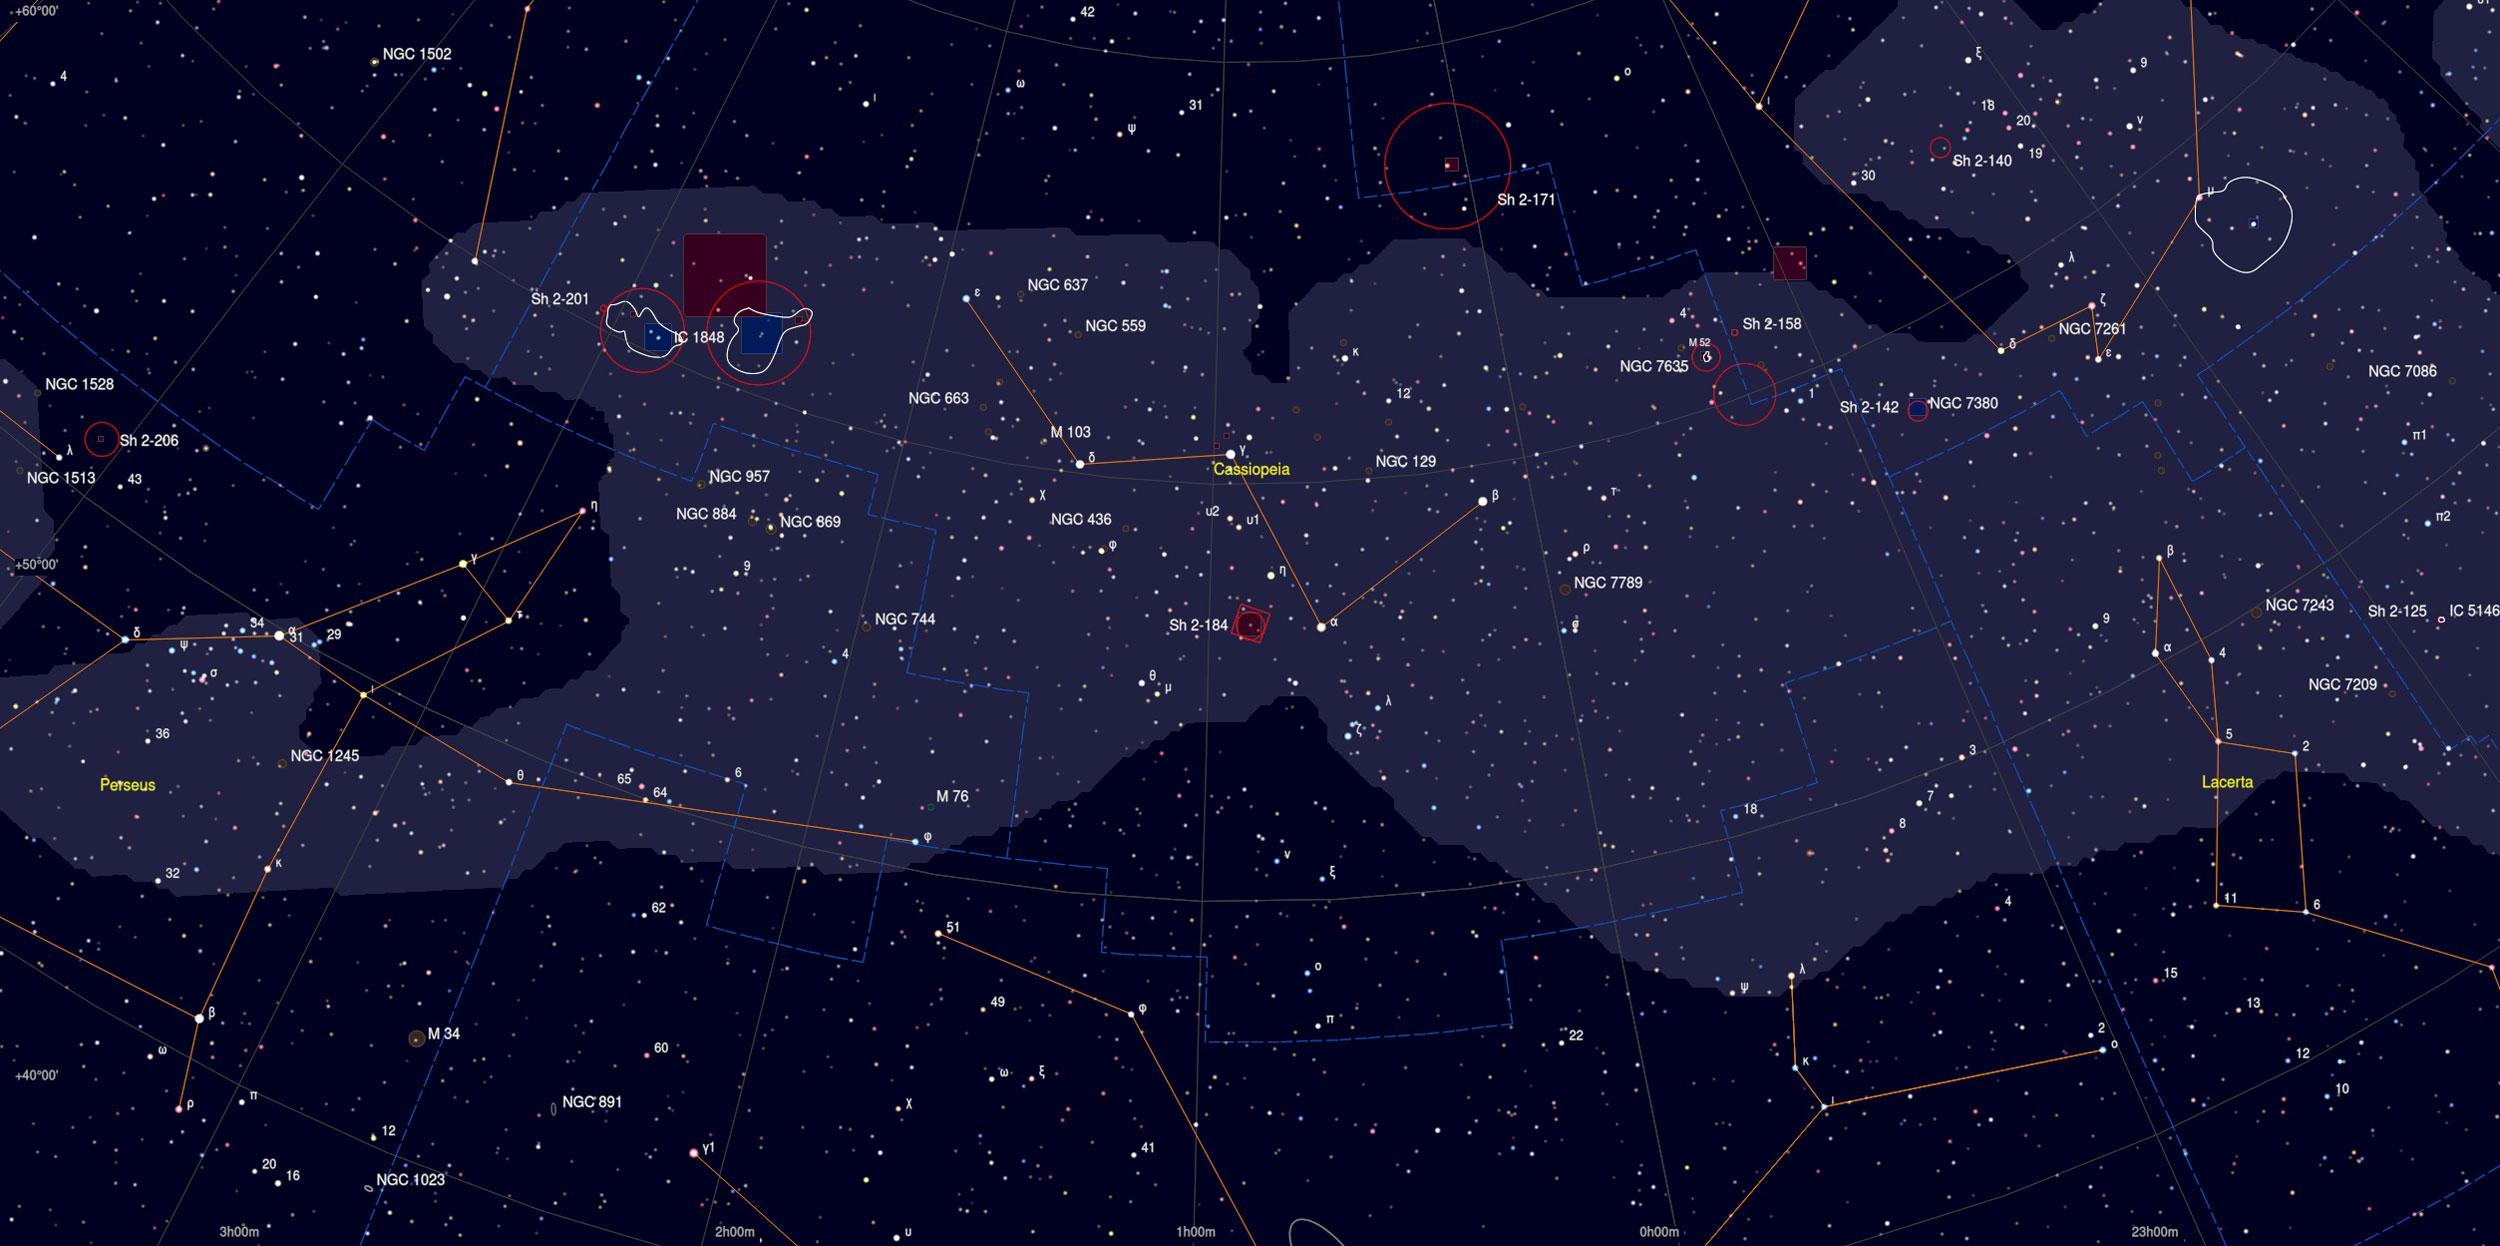 Pacman Nebula Sky Chart - Astrophotography Martin Rusterholz